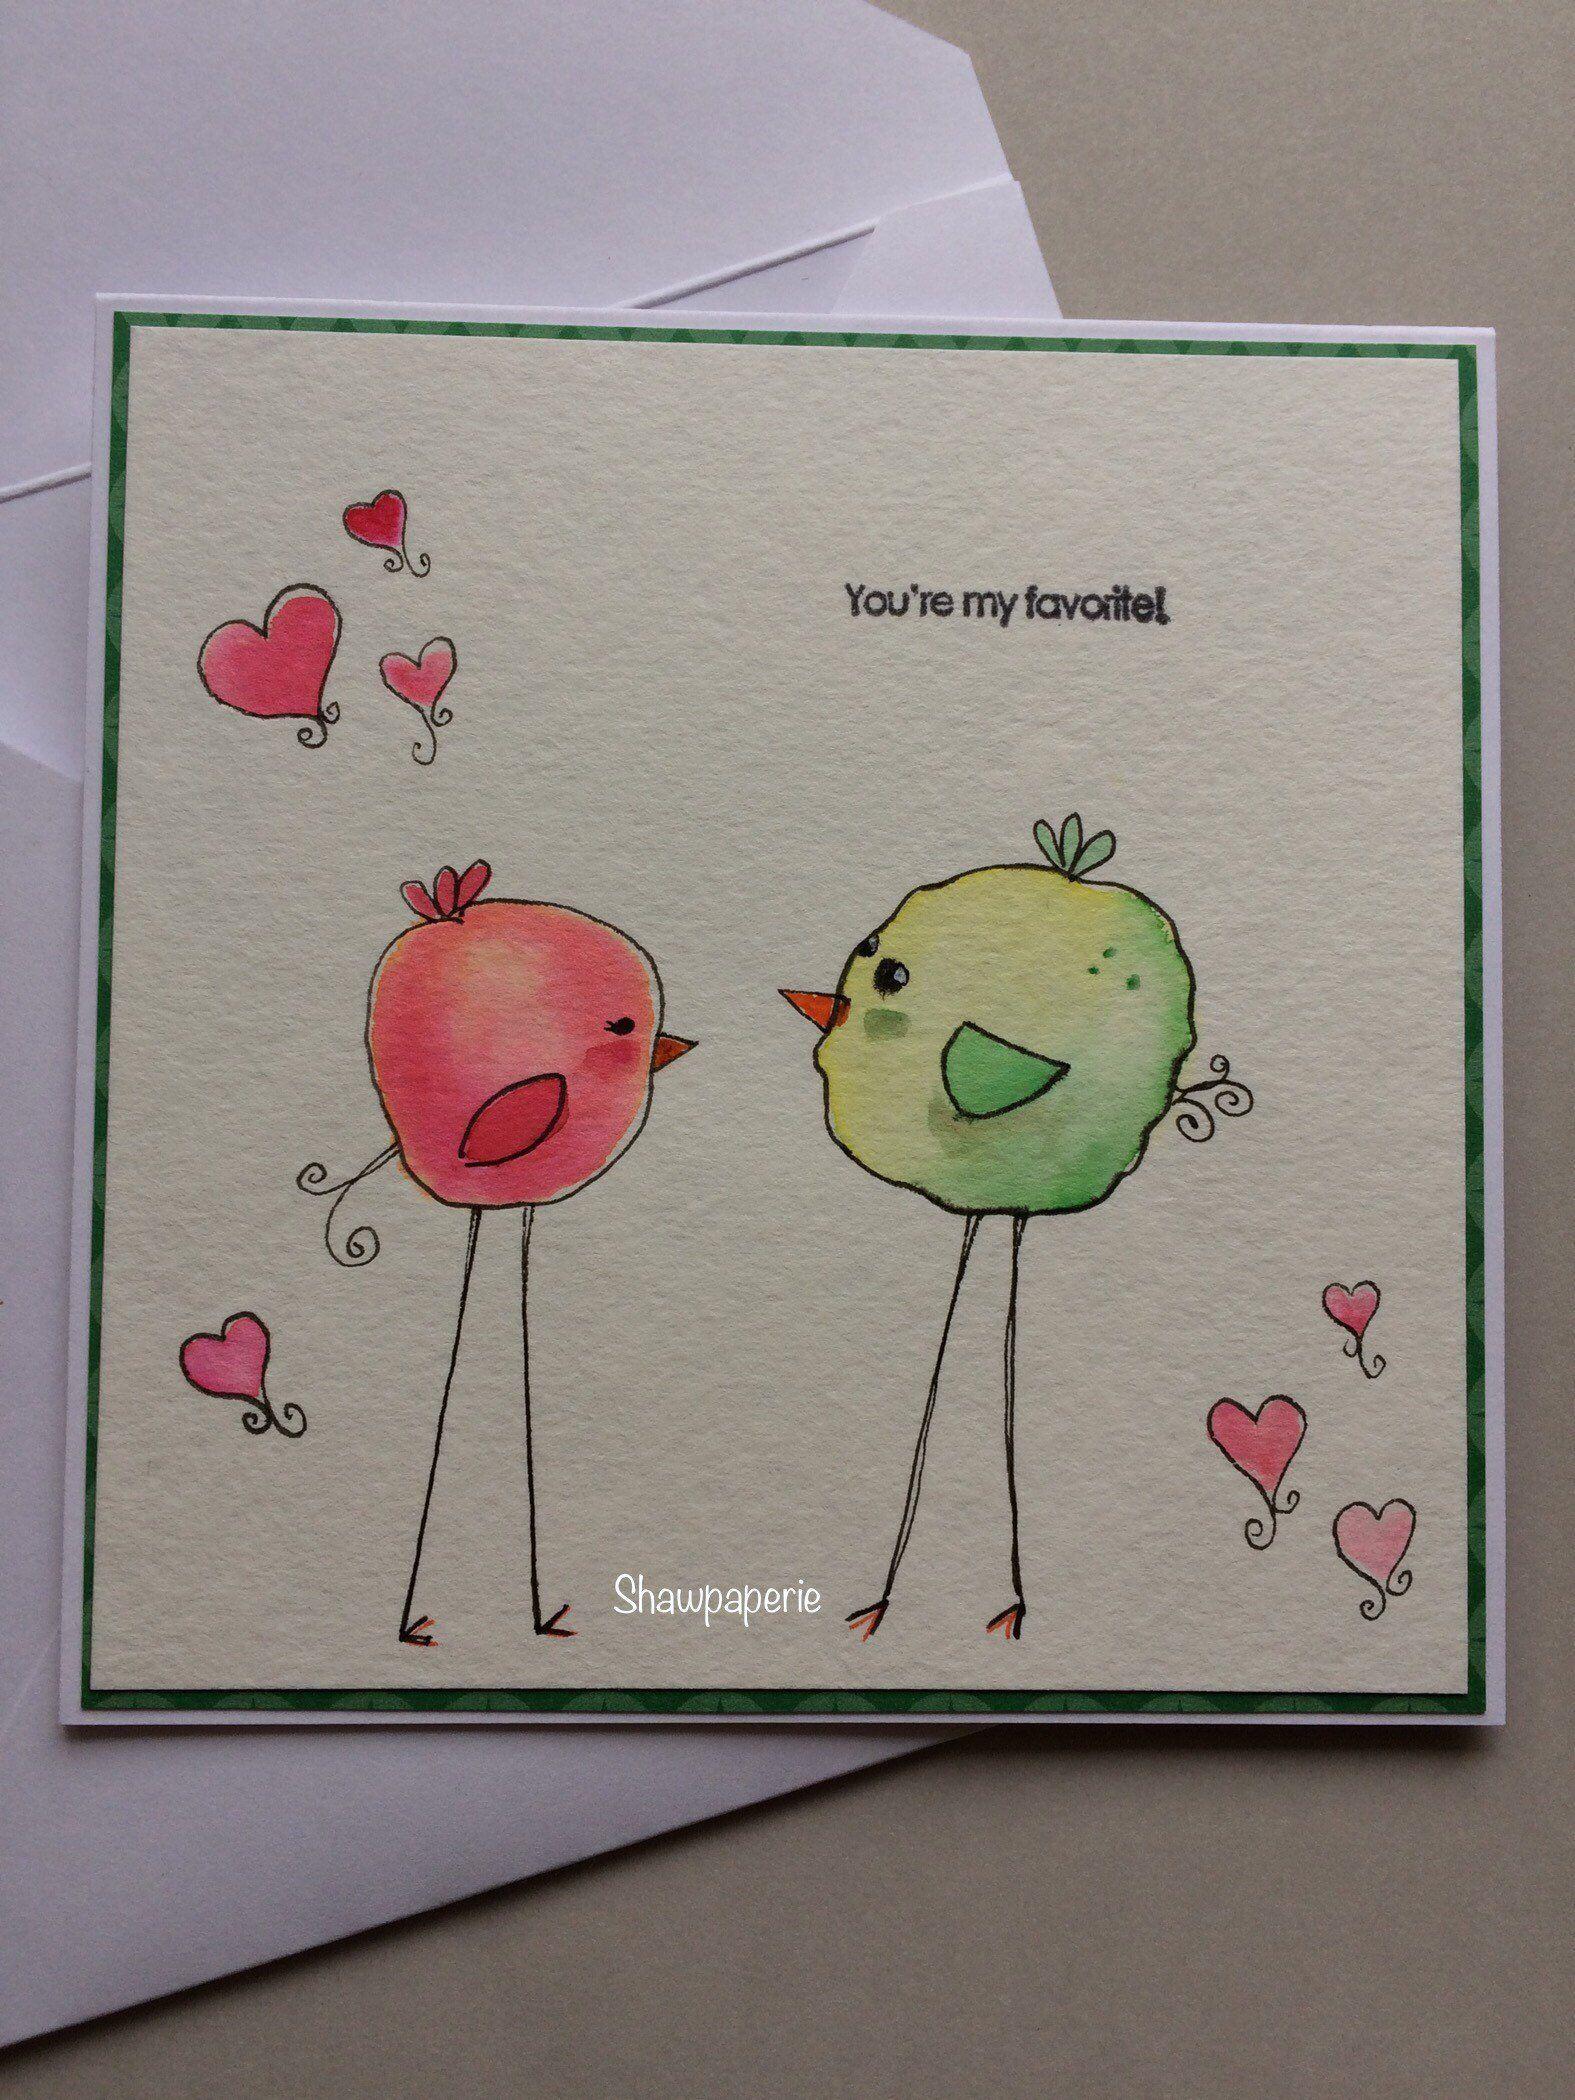 Sh Handmade Watercolor Anniversary Card Etsy Watercolor Anniversary Card Card Drawing Anniversary Cards